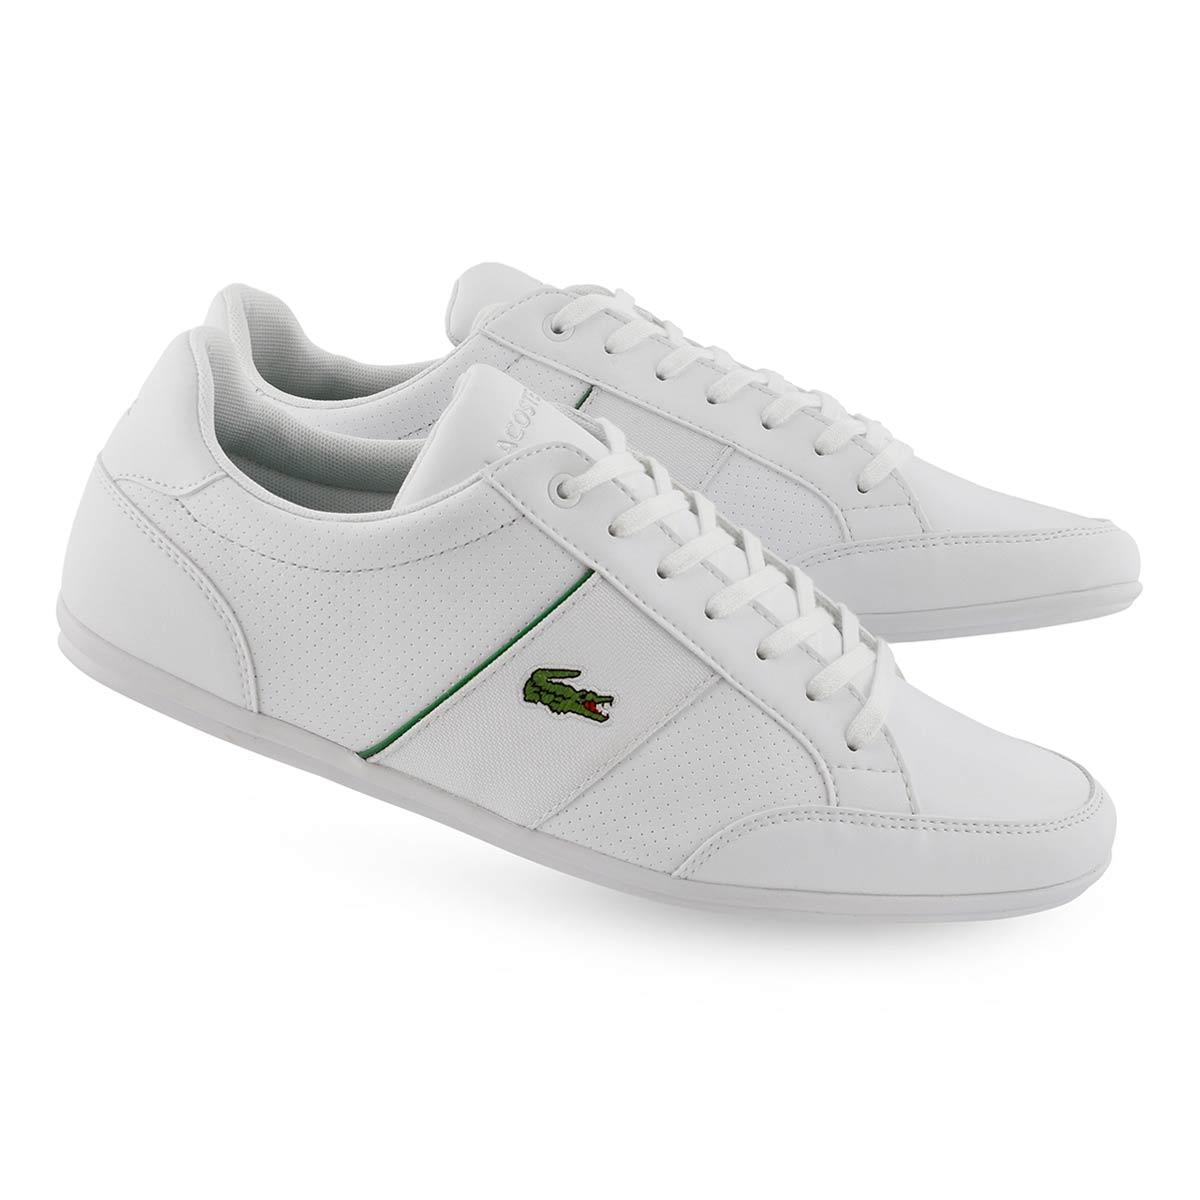 Mns Nivolor 119 1 P wht/grn sneaker